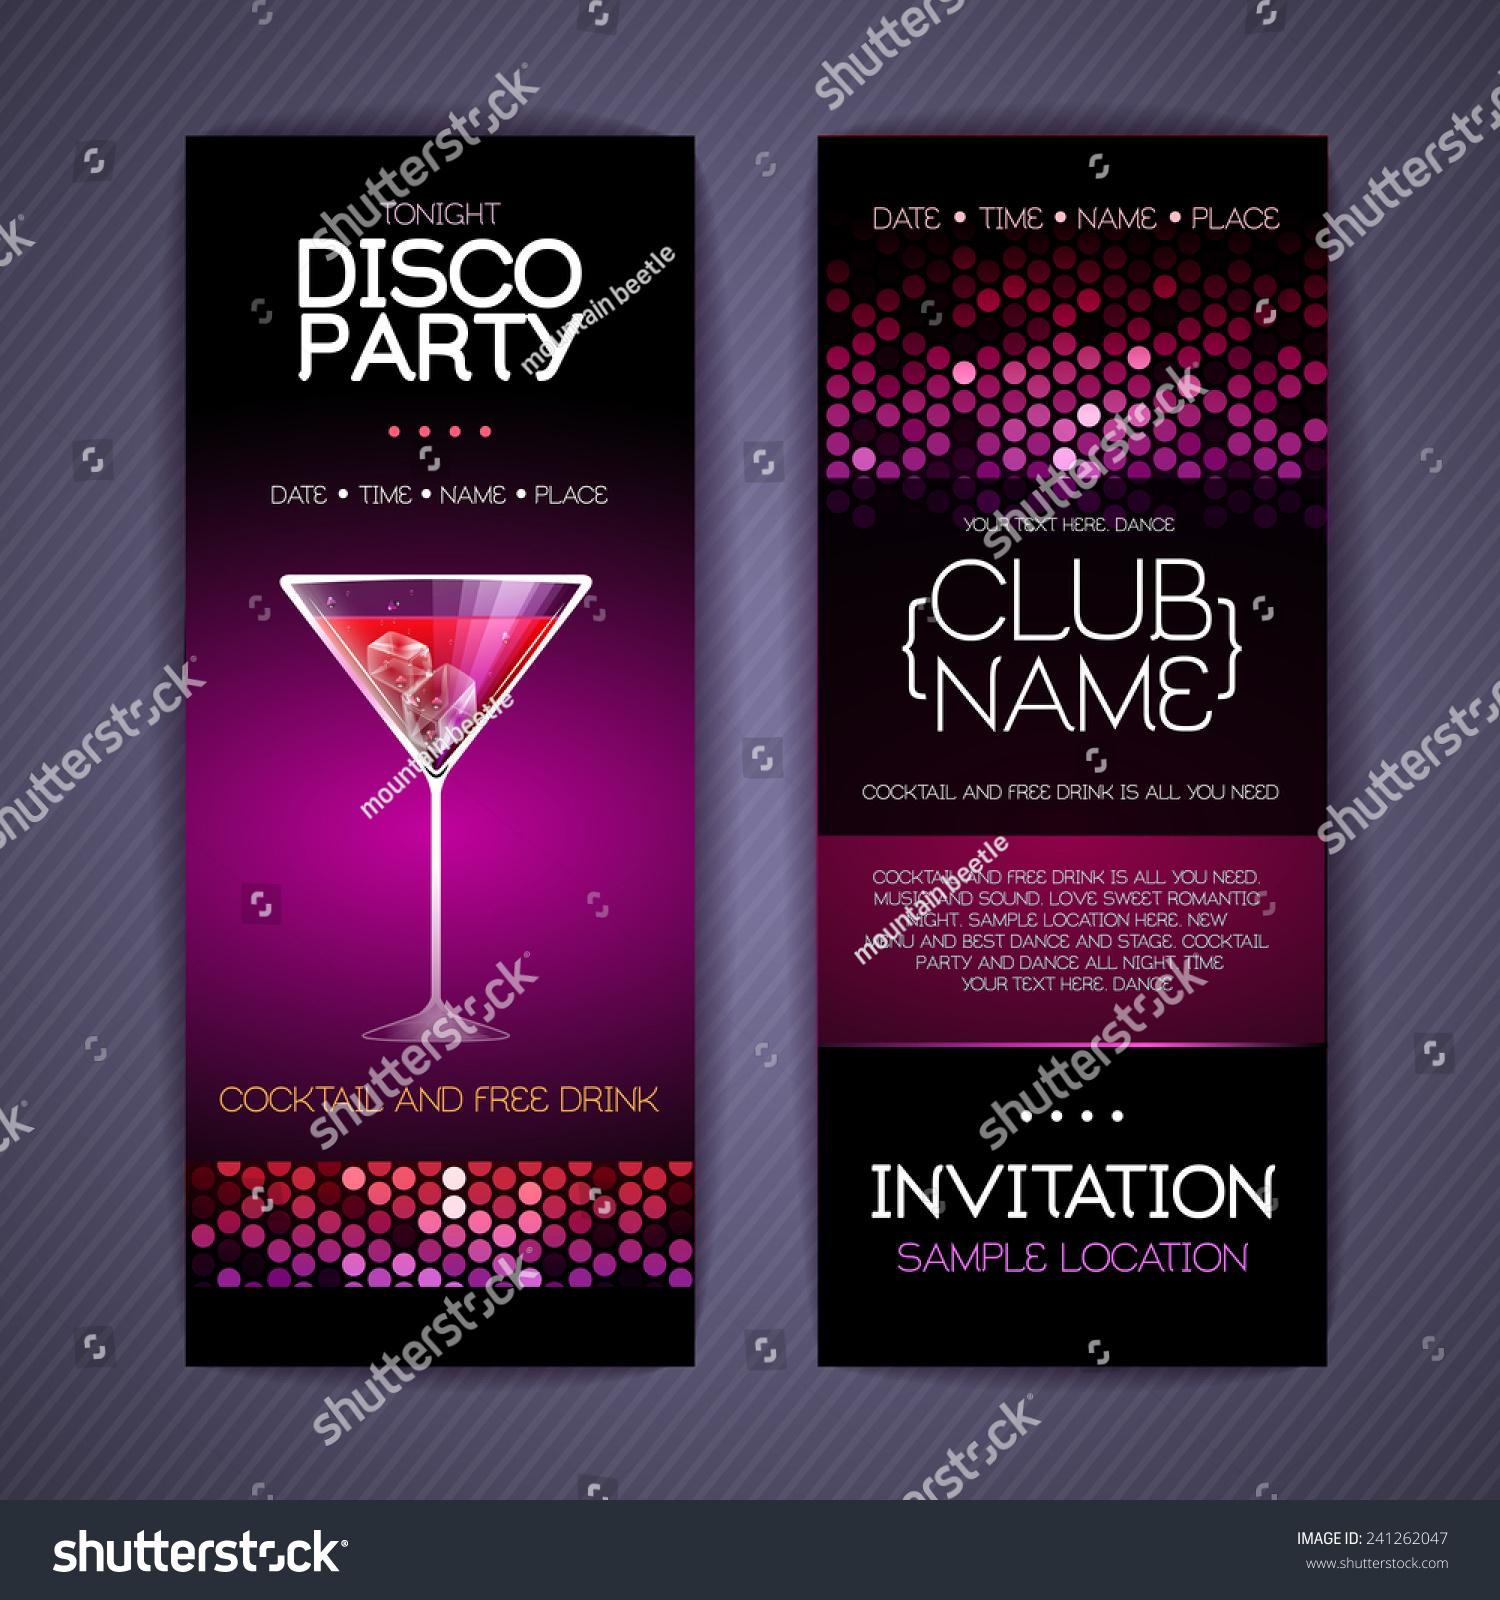 Disco party invitations – Disco Party Invitation Ideas